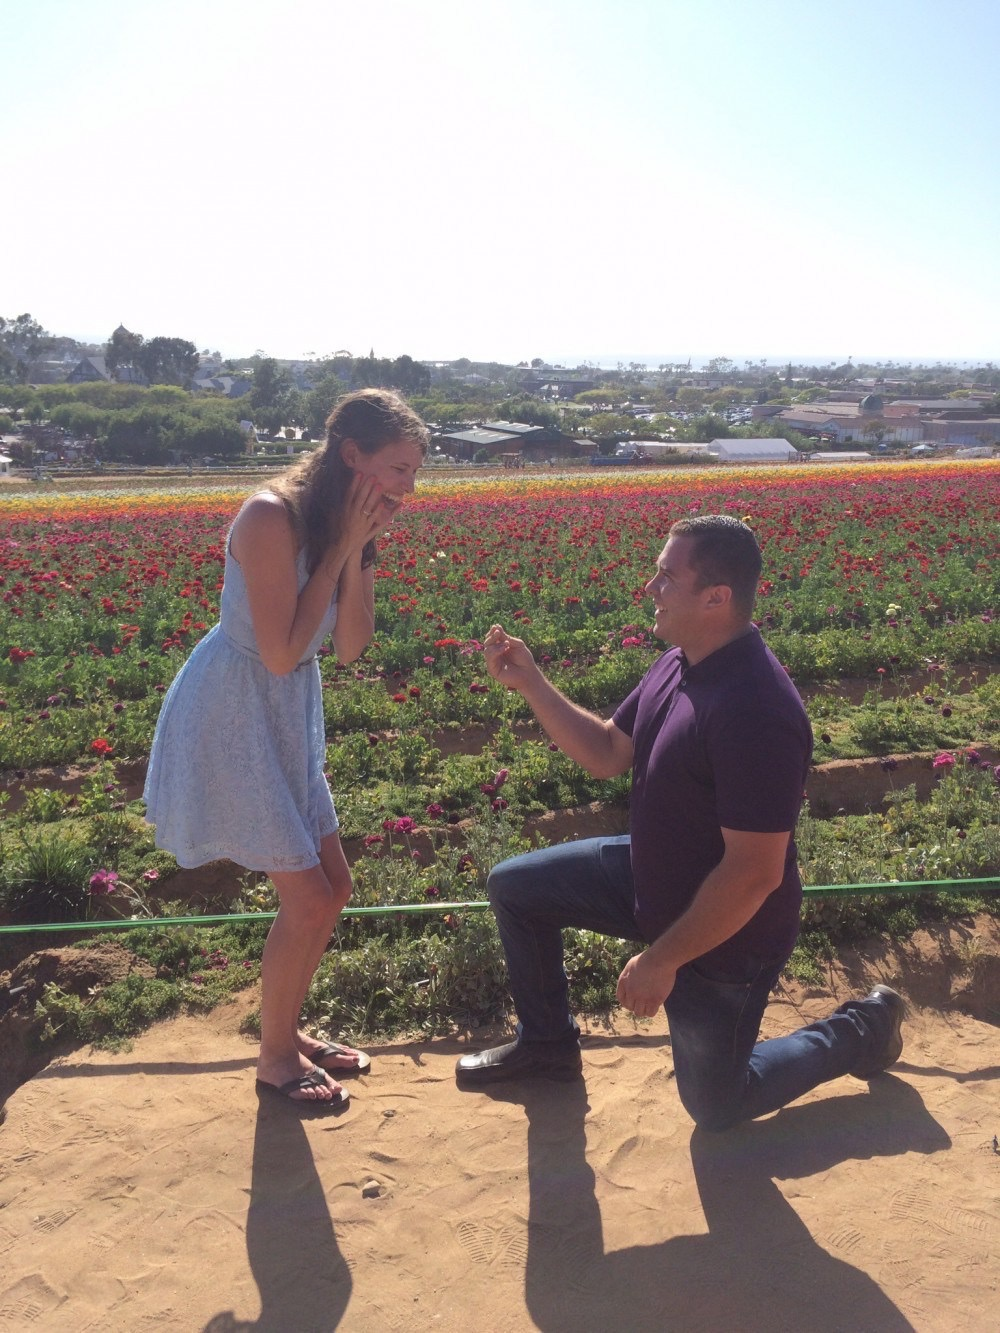 Kristy's Proposal Story 2